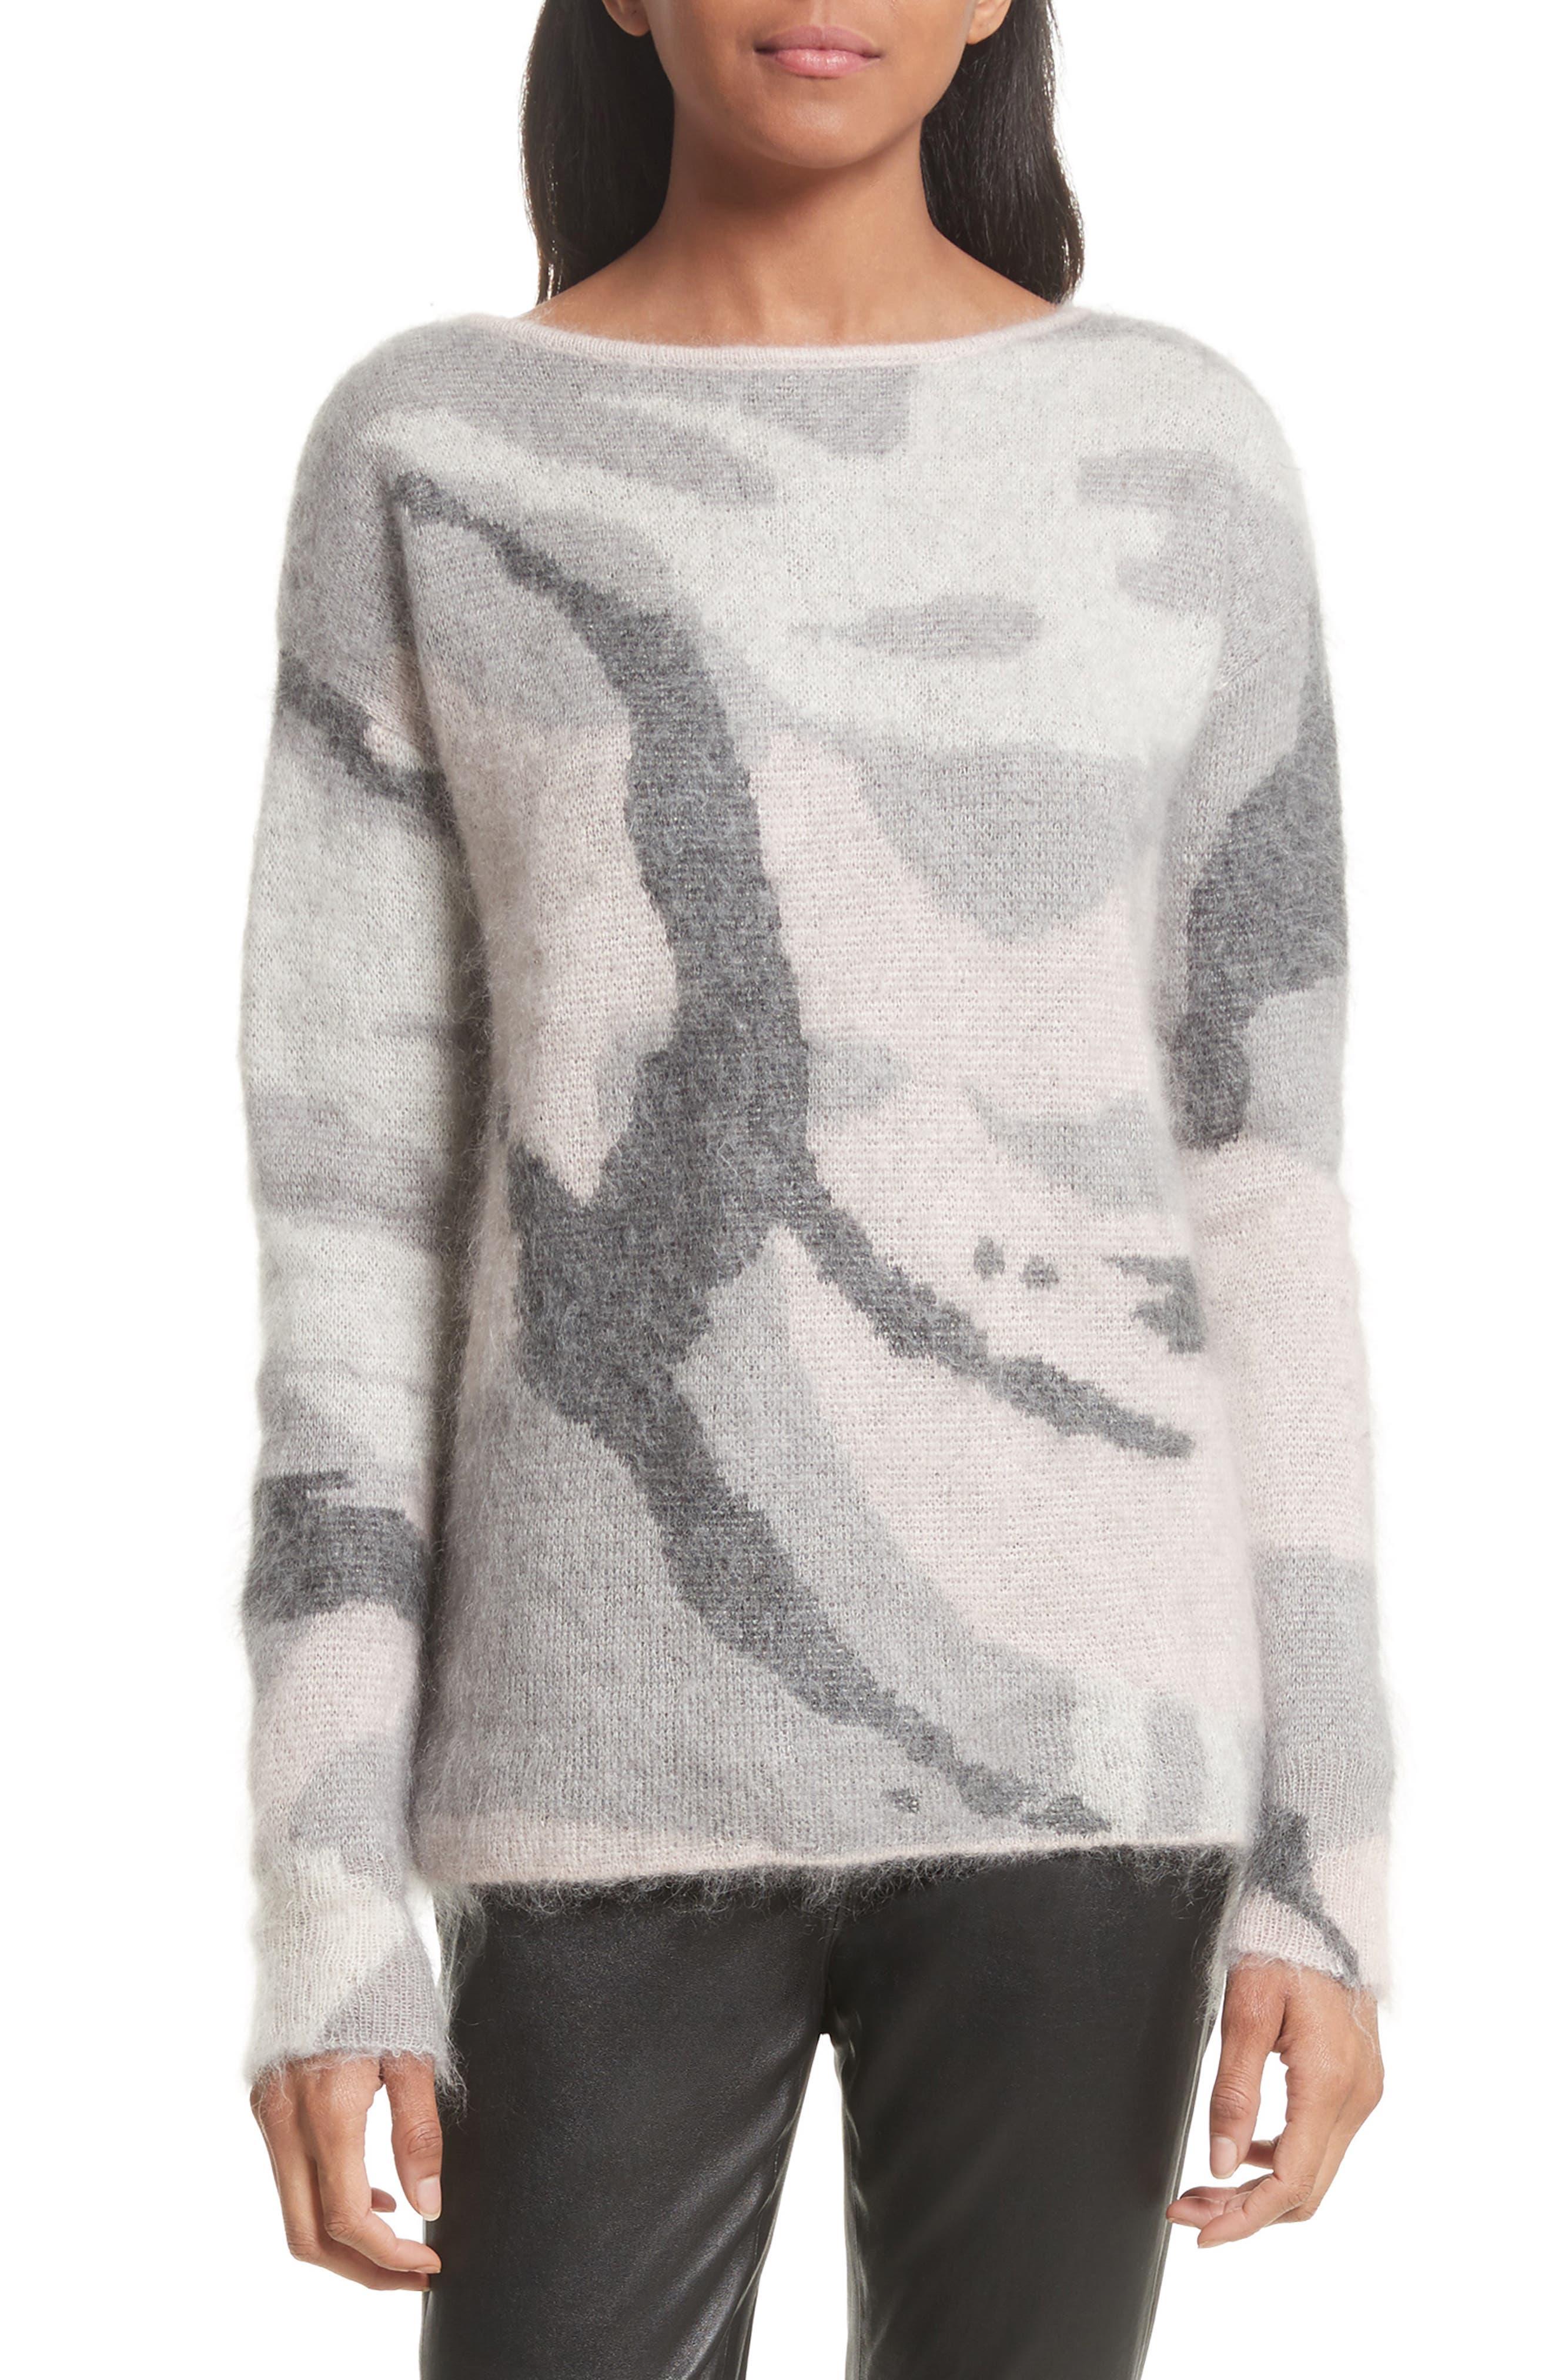 Main Image - rag & bone Sinclair Camouflage Jacquard Sweater